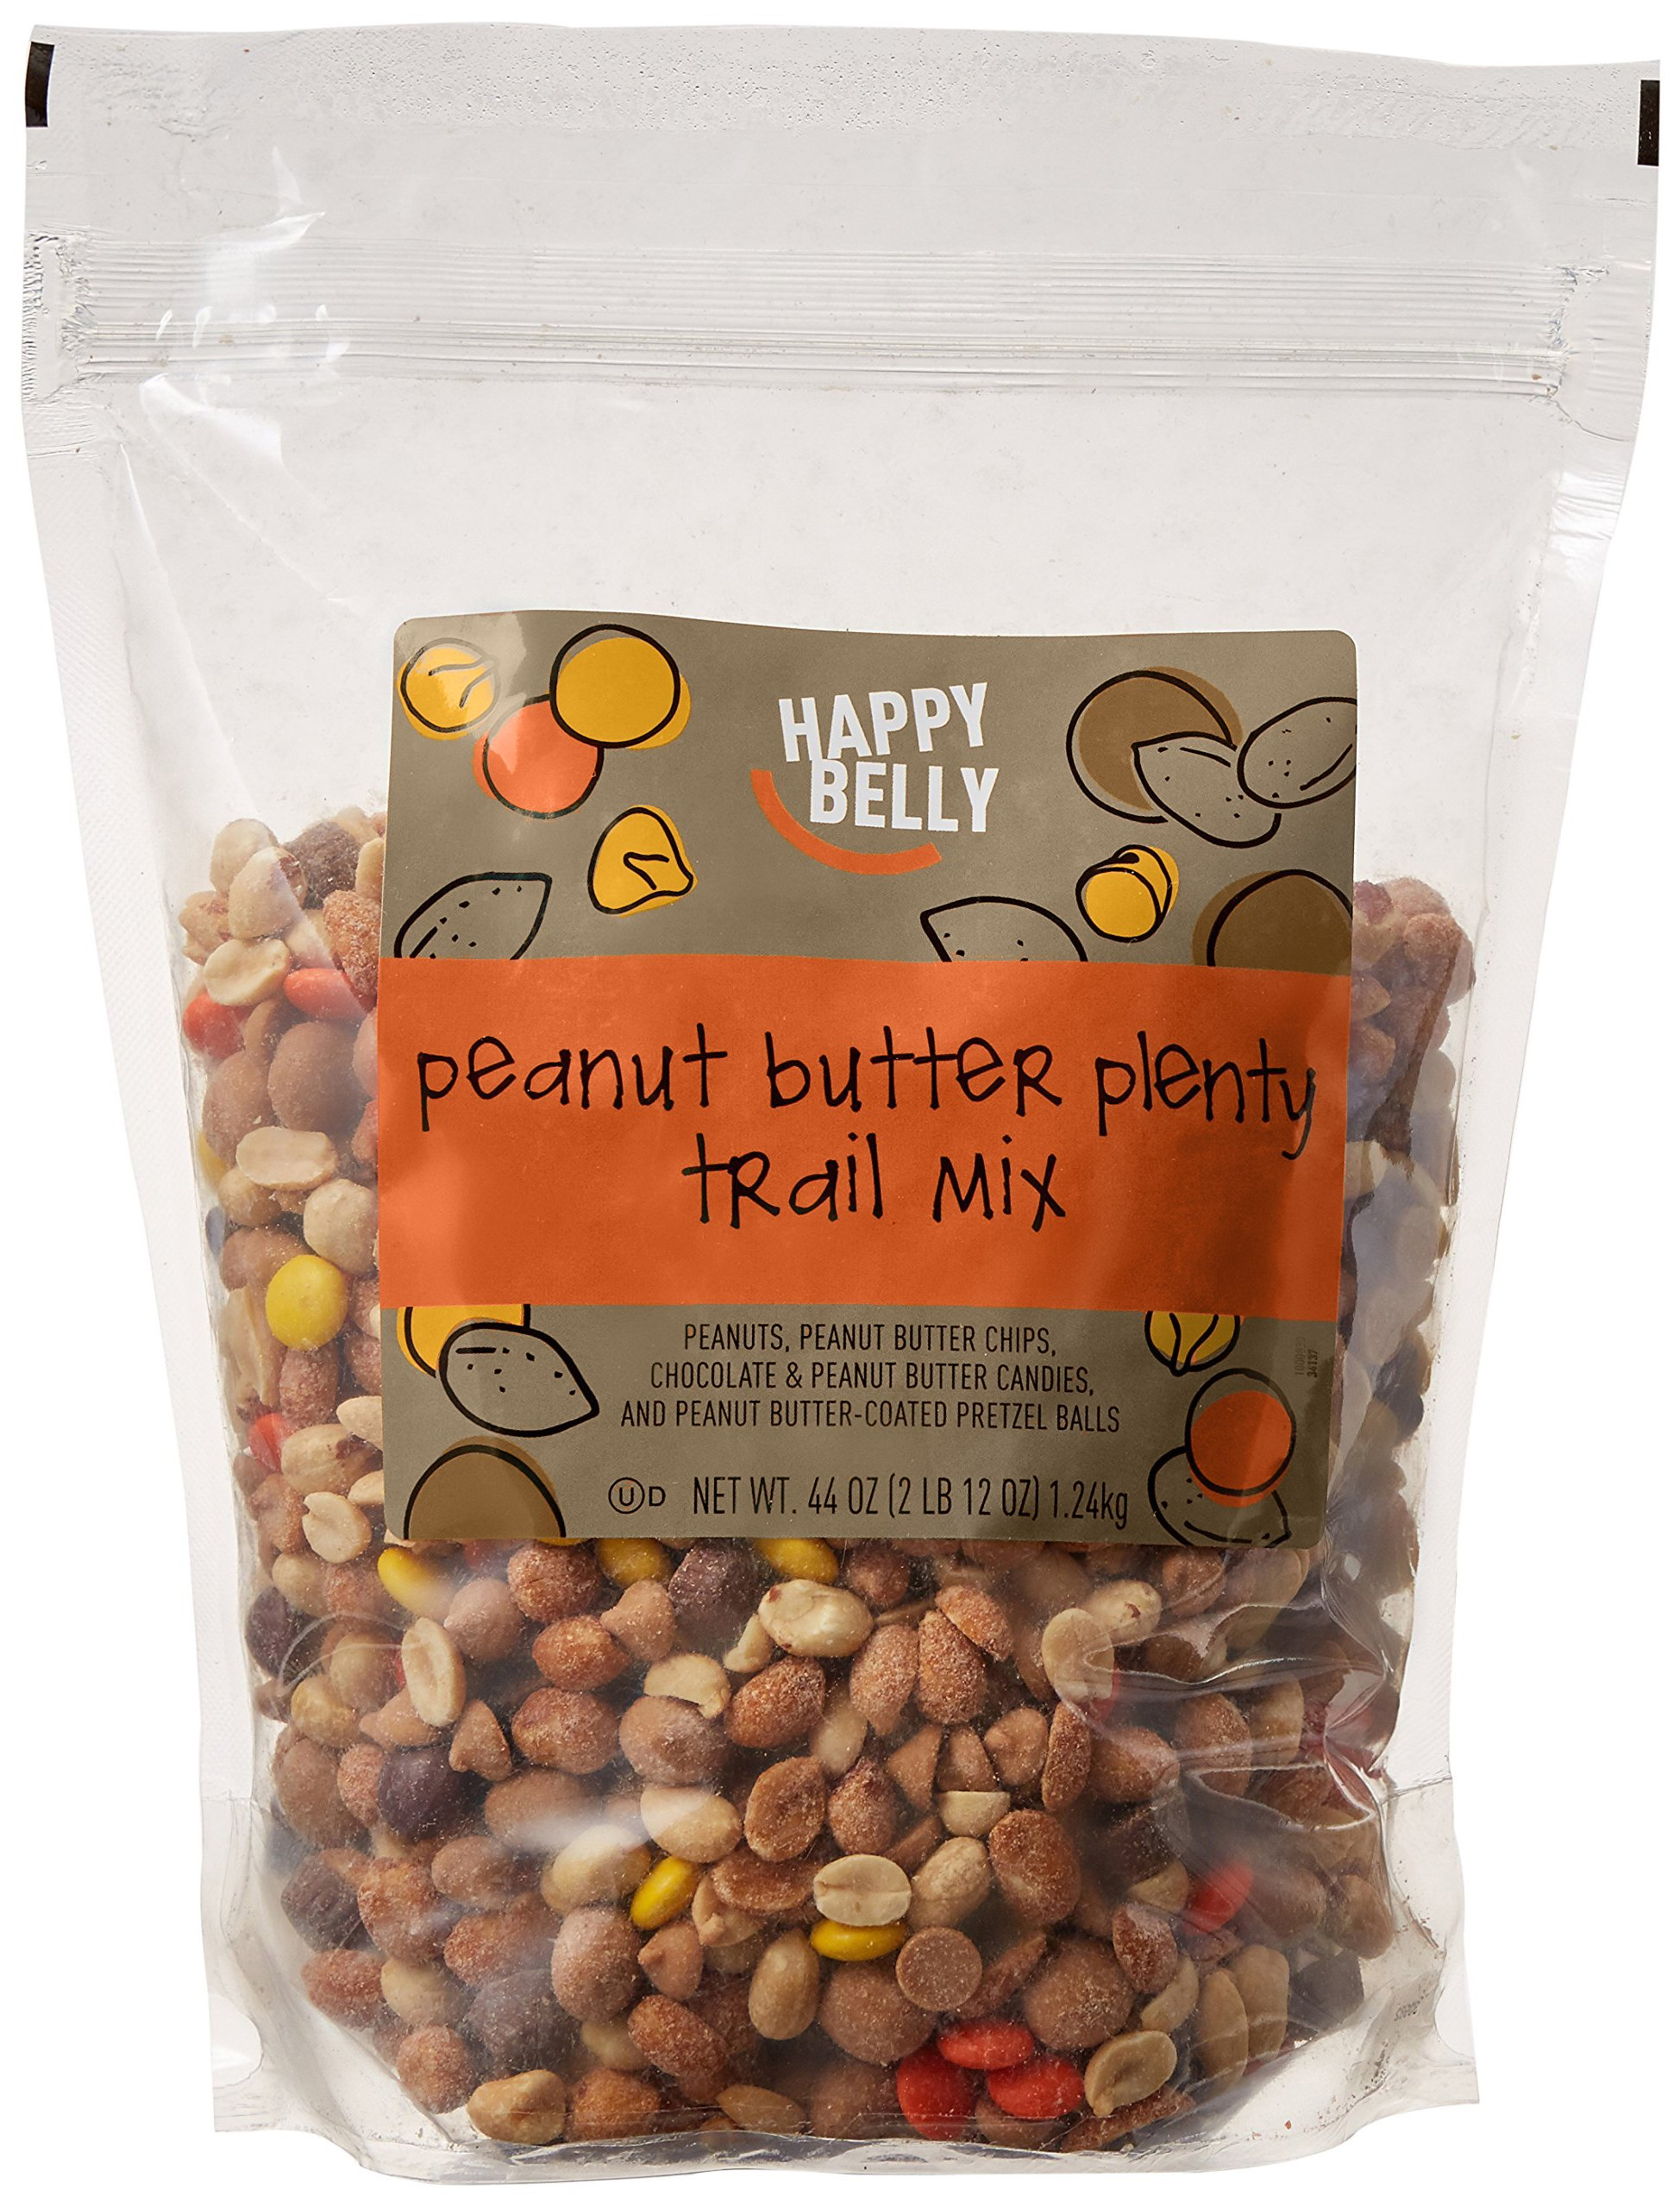 Amazon Brand - Happy Belly Peanut Butter Plenty Trail Mix, 44 ounce